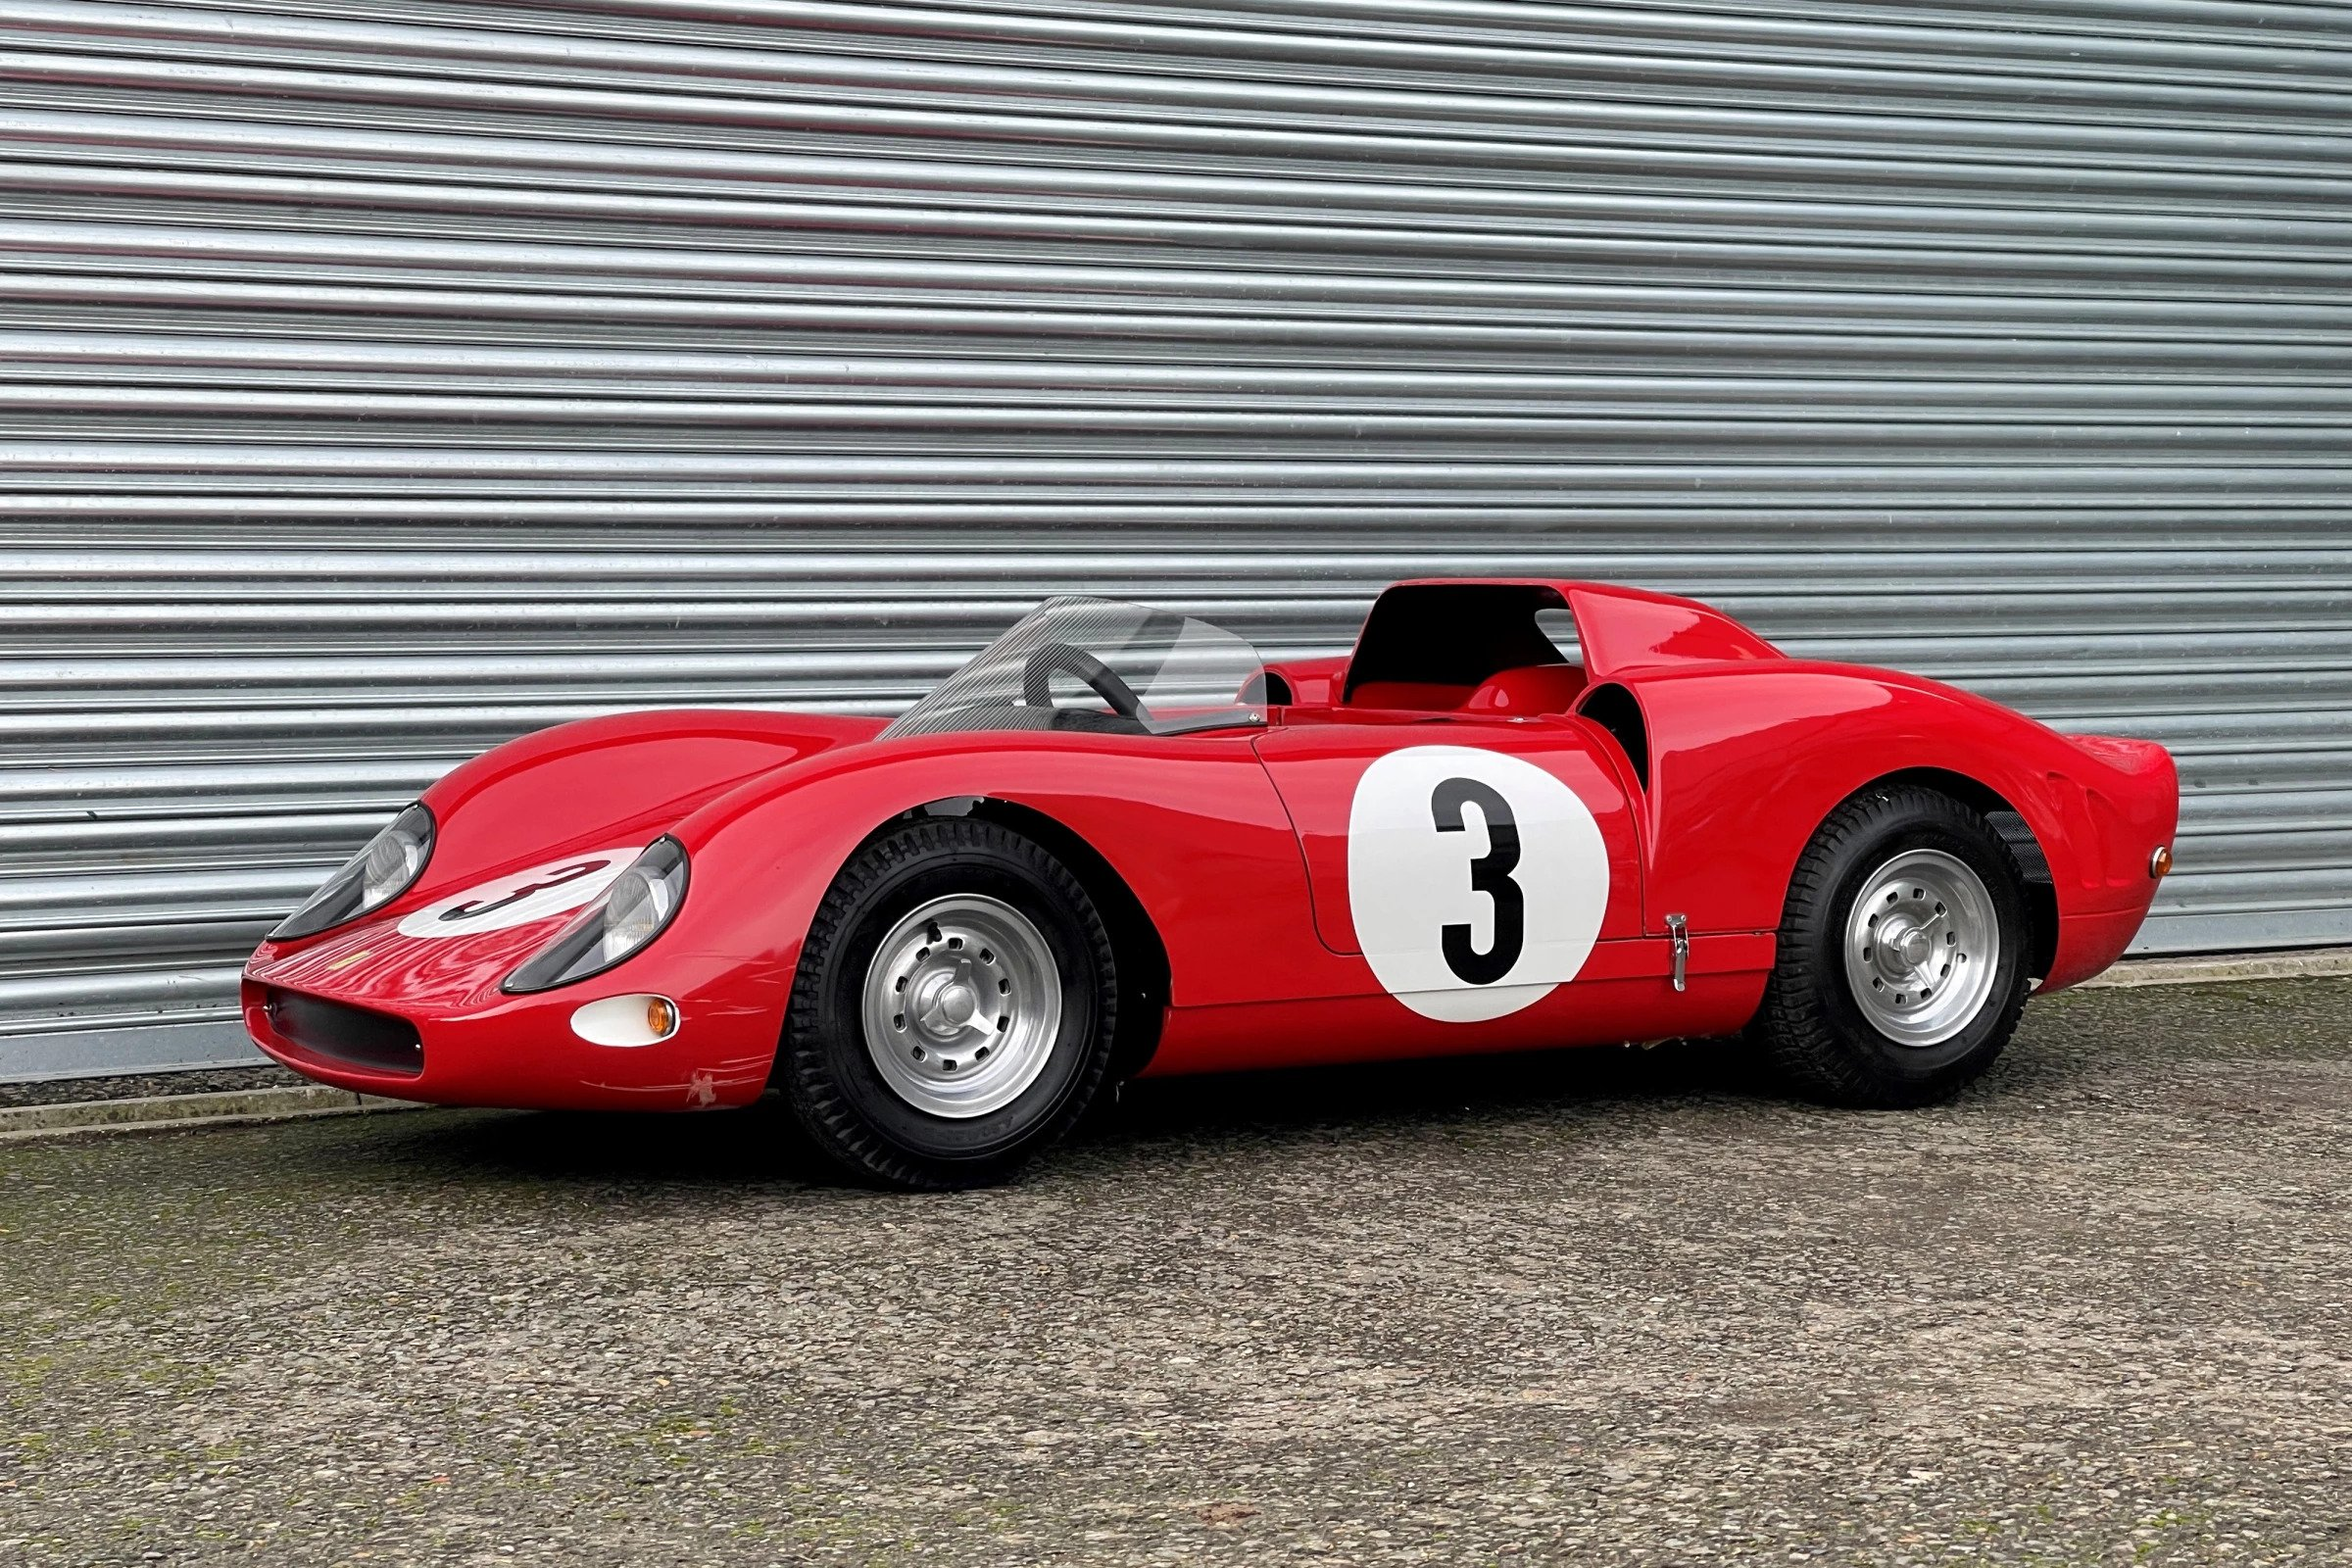 Children's Ferrari Replica Sets A New Price Record At Paris Auction